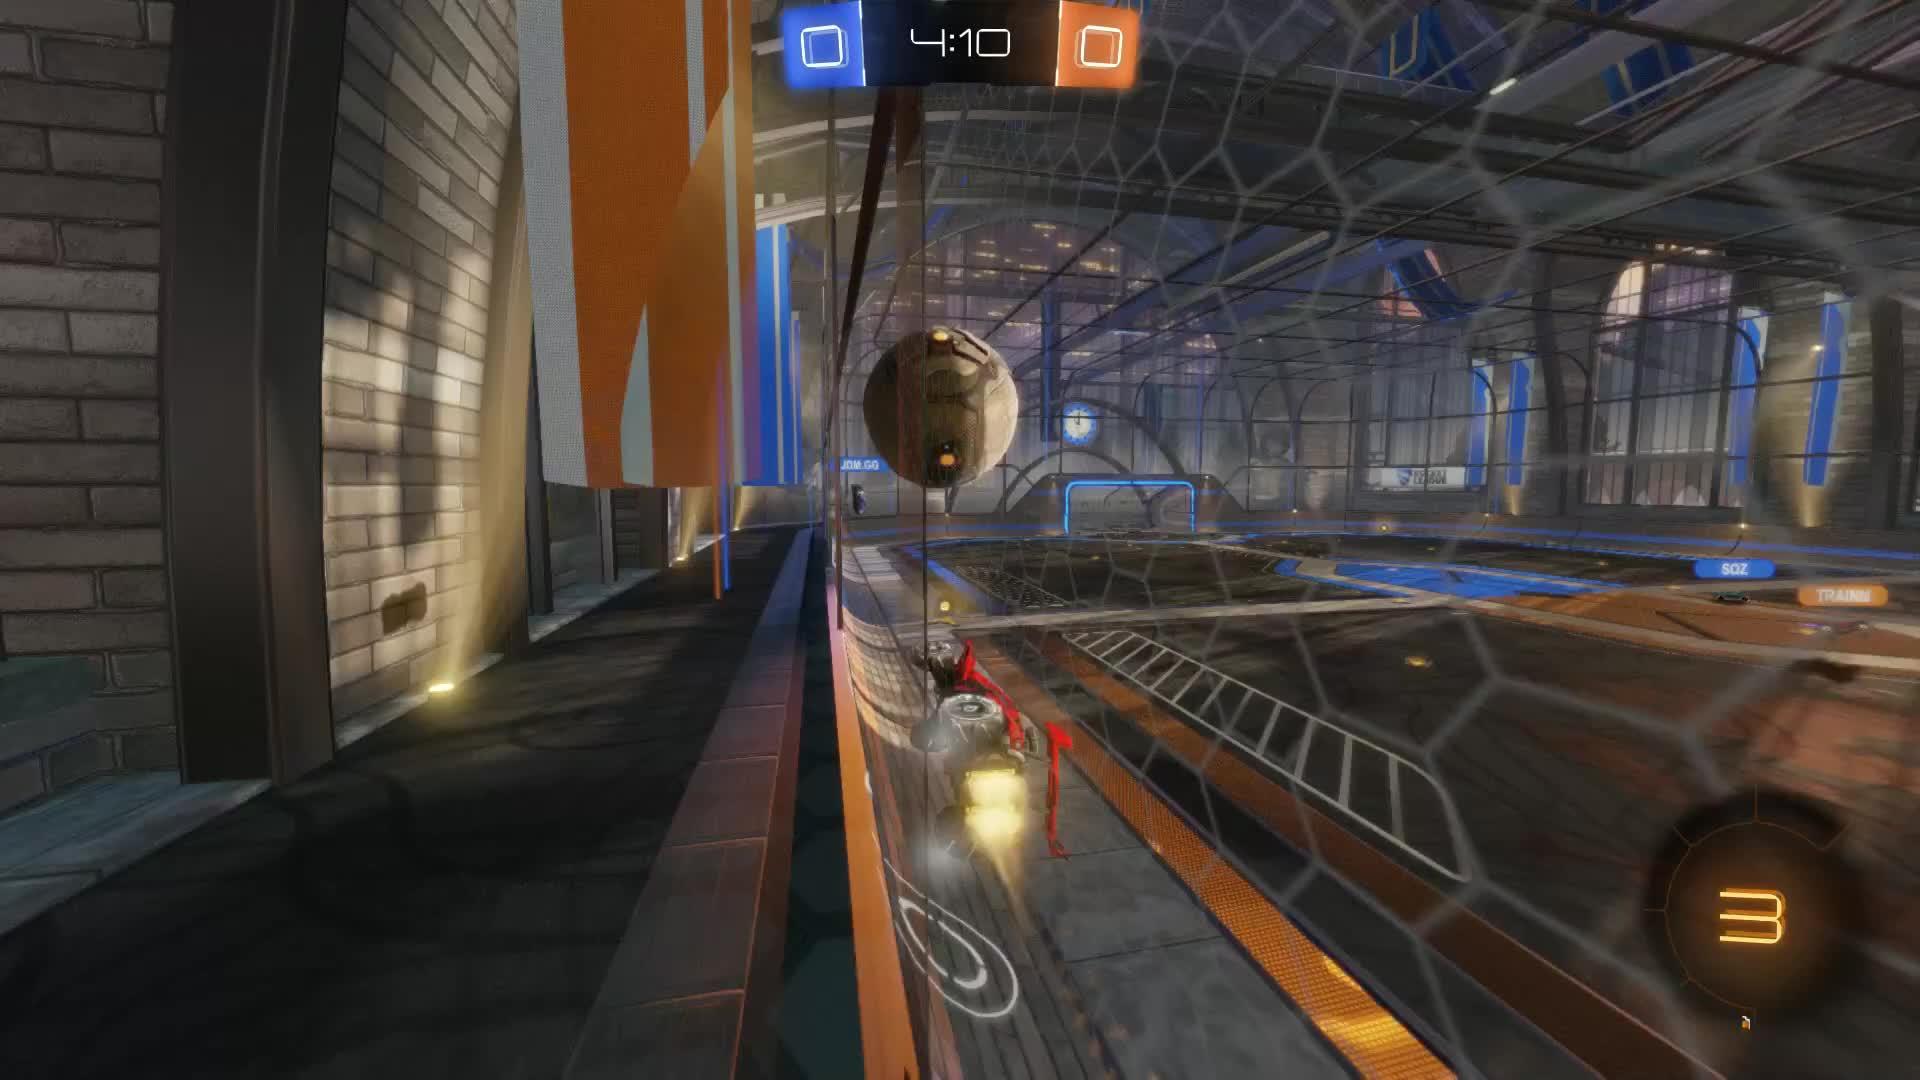 Gif Your Game, GifYourGame, Goal, Rocket League, RocketLeague, milk, Goal 1: milk GIFs